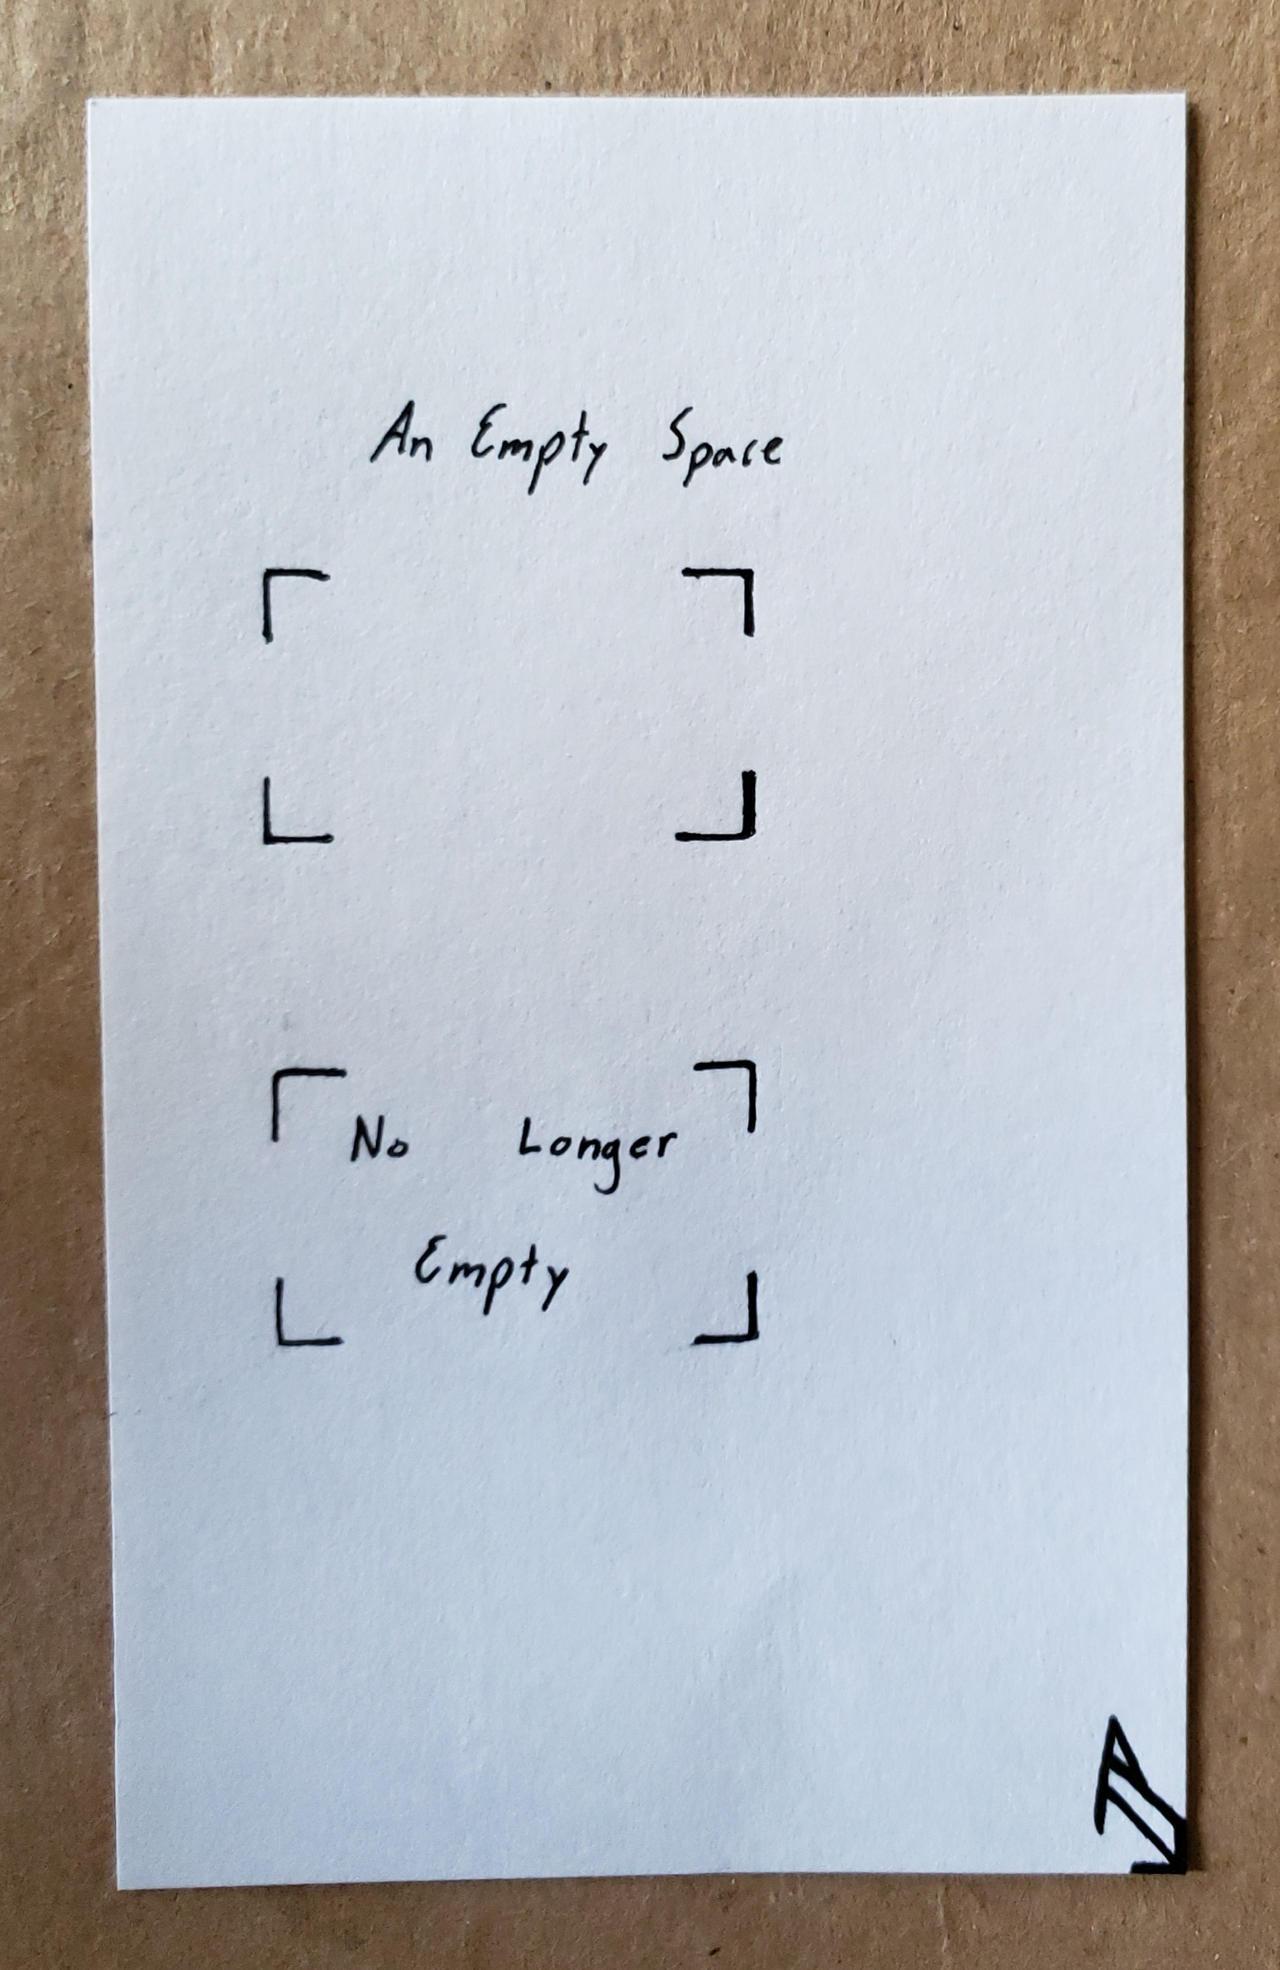 No Longer Empty